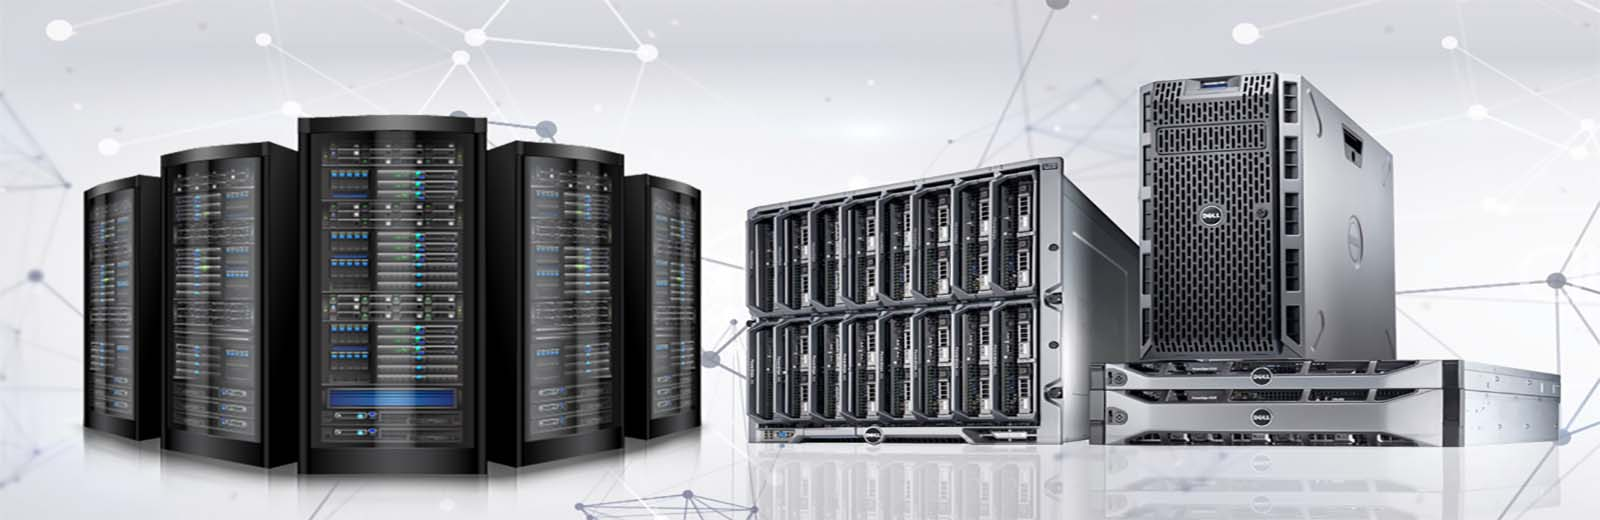 Server-Banner-Electric-City-Web-Company